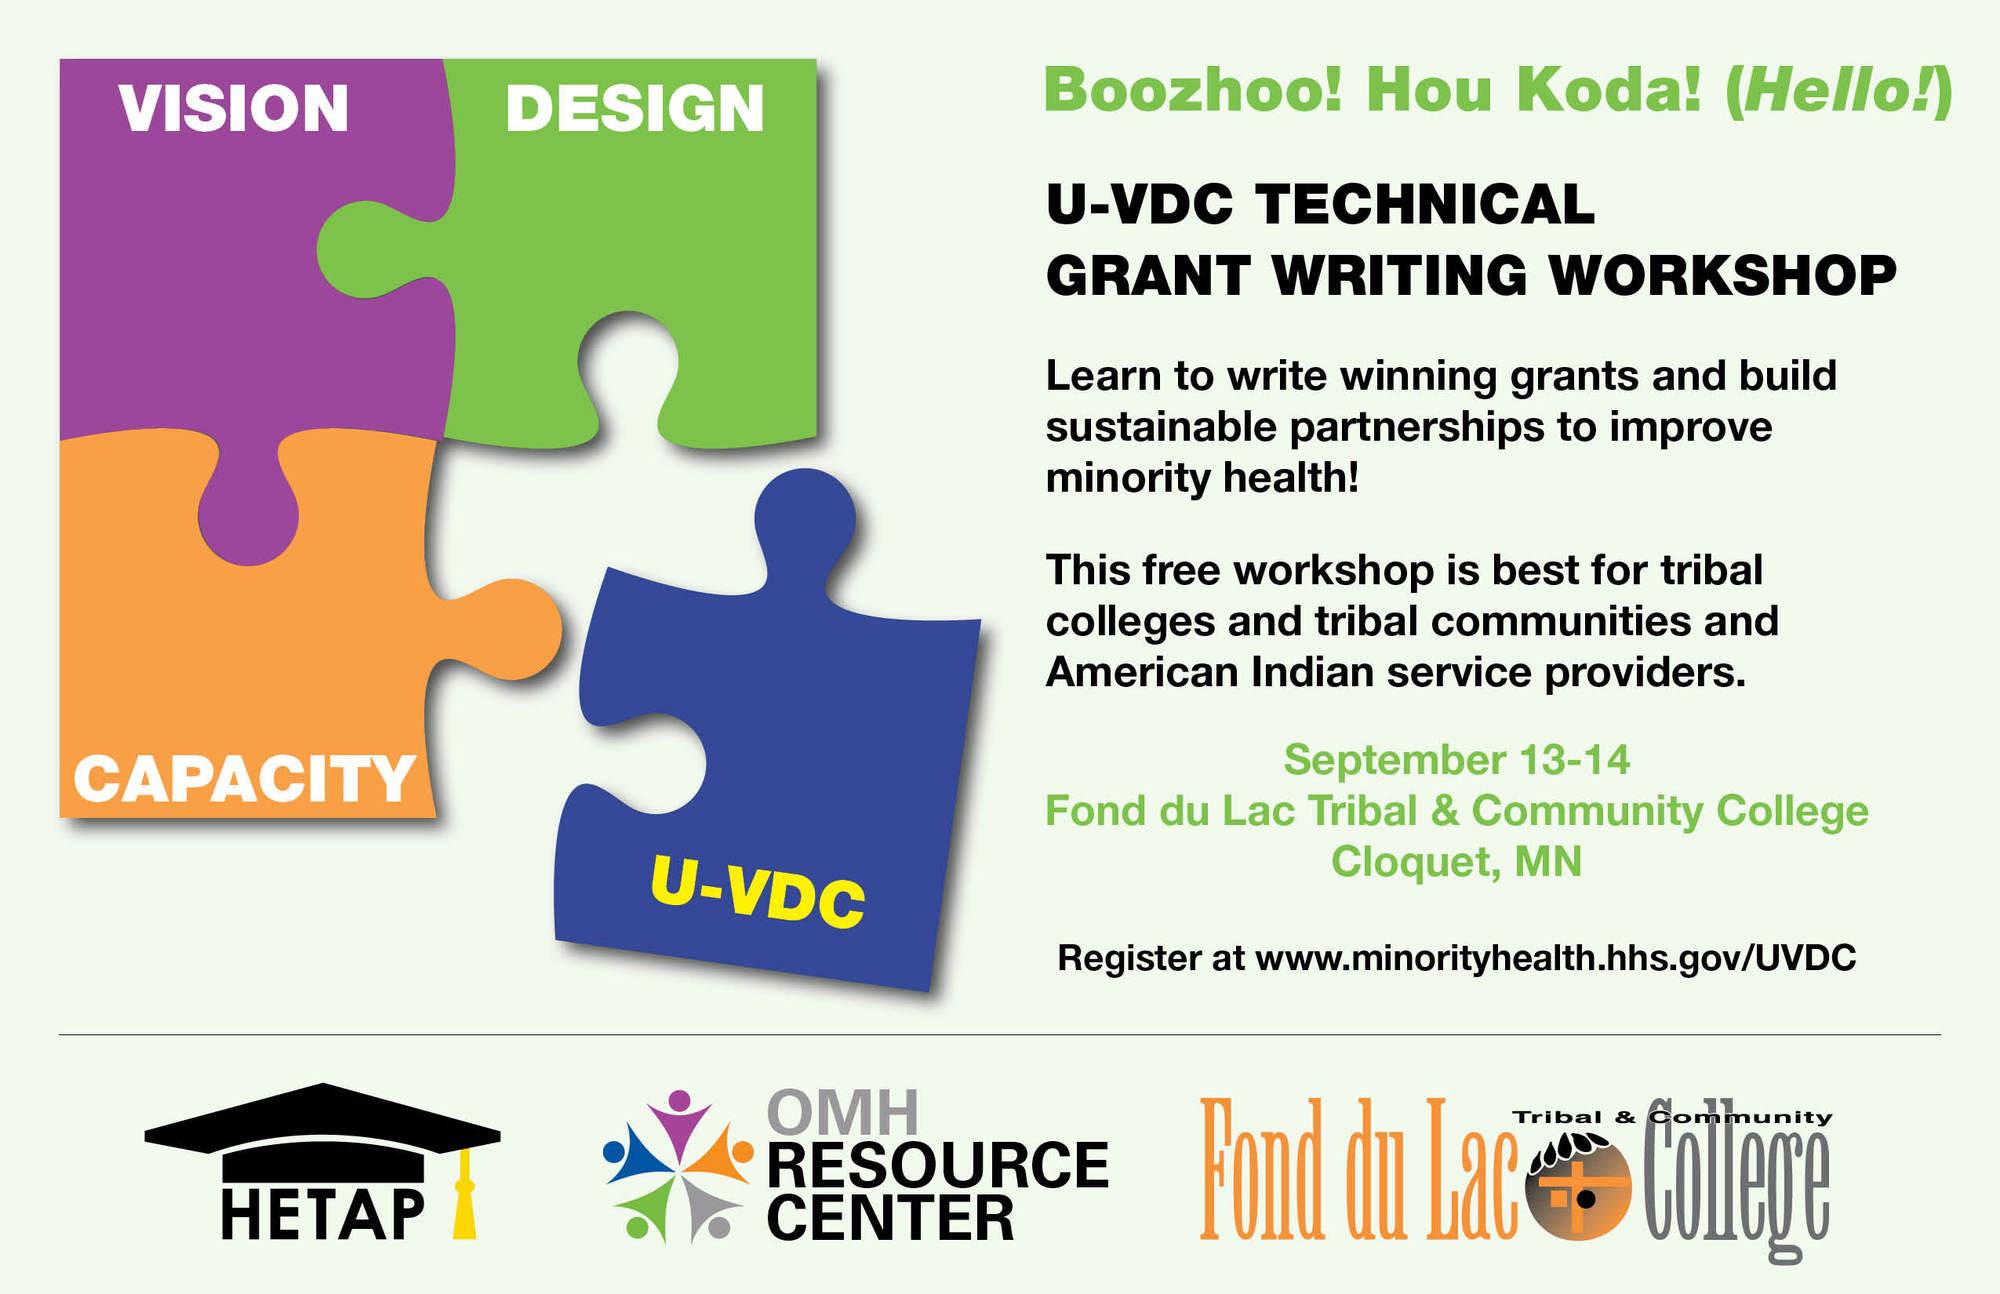 Fond du Lac UVDC Grant Writing Workshop